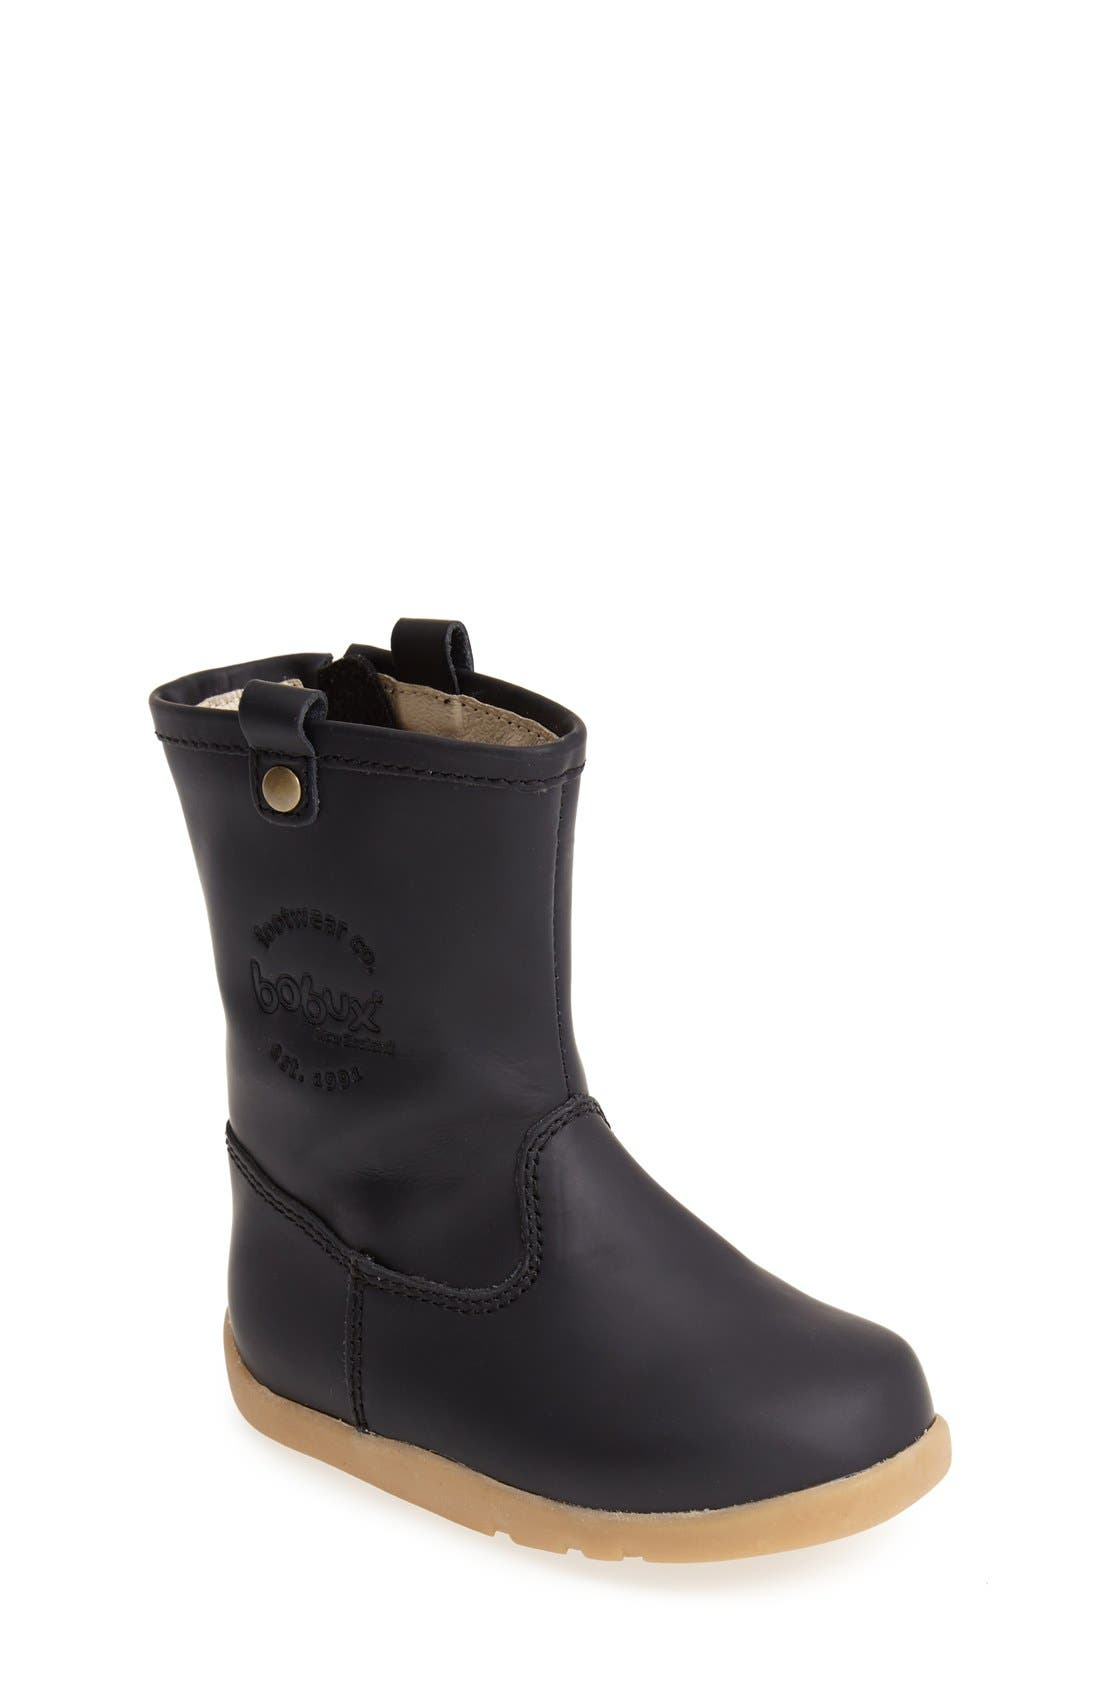 'I-Walk - Splash' Waterproof Rain Boot,                             Main thumbnail 1, color,                             001